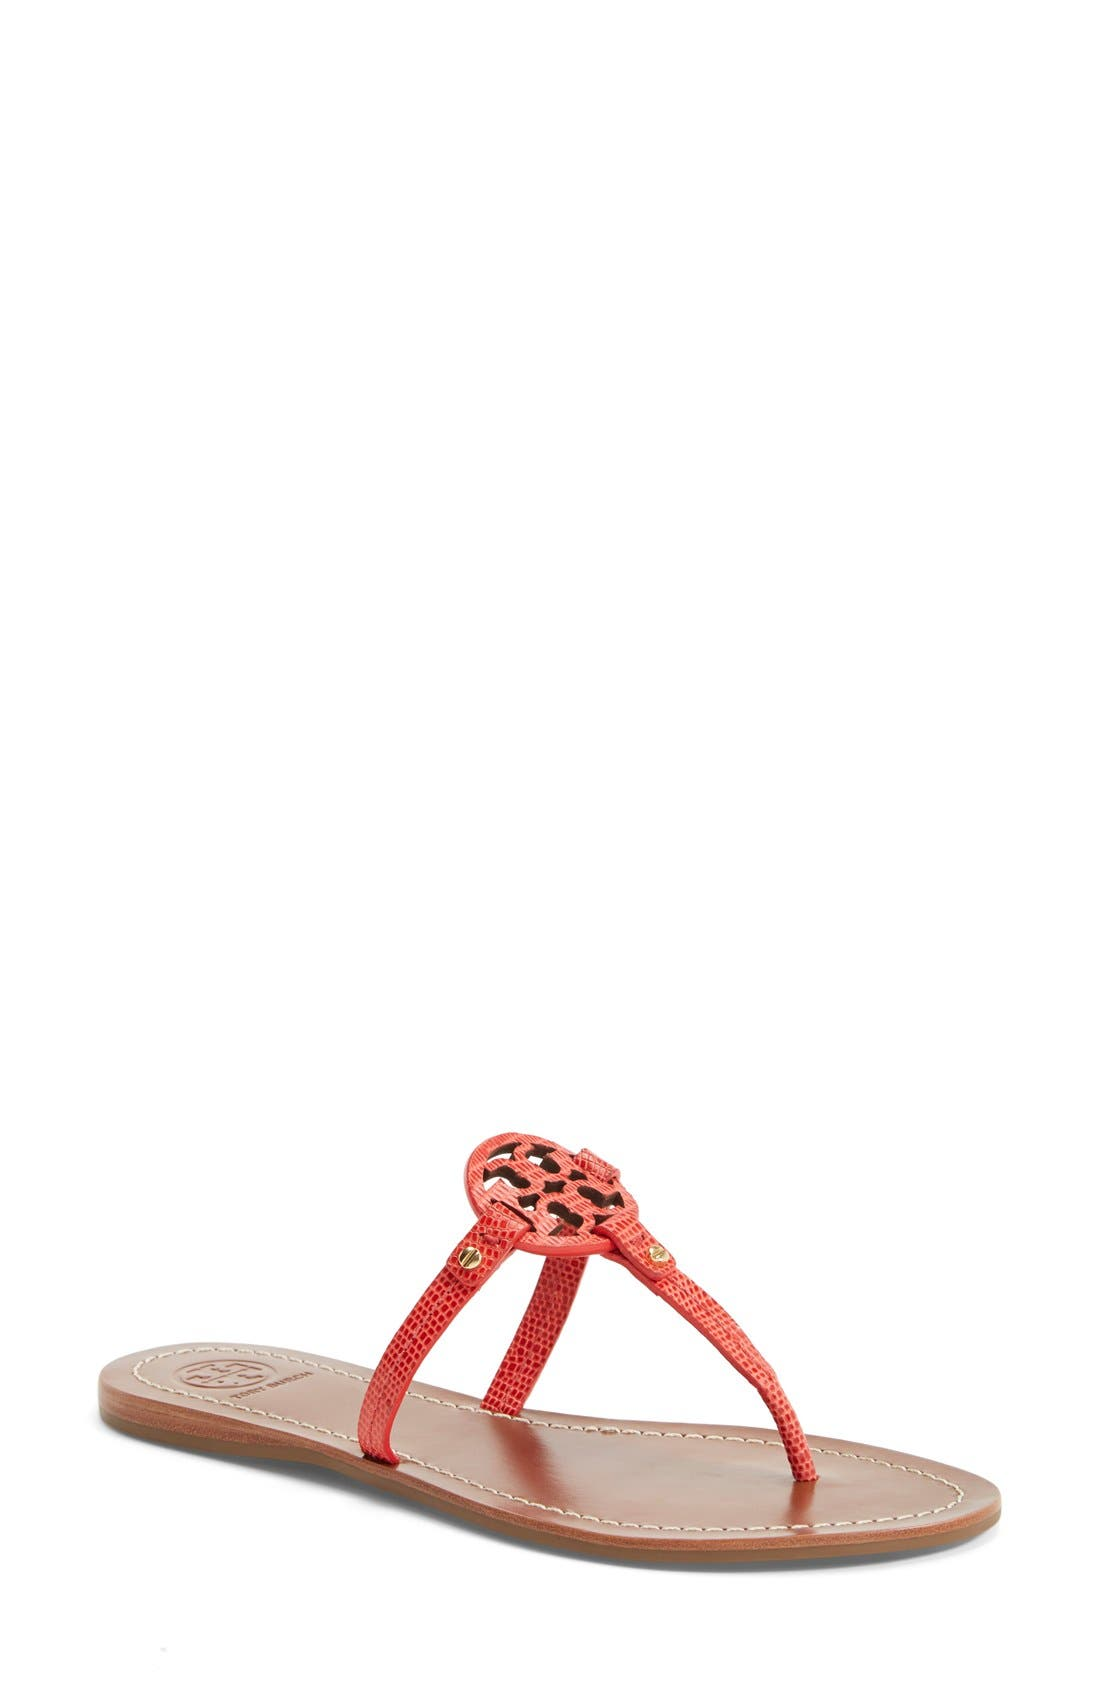 Alternate Image 1 Selected - Tory Burch 'Mini Miller' Leather Thong Sandal (Women)